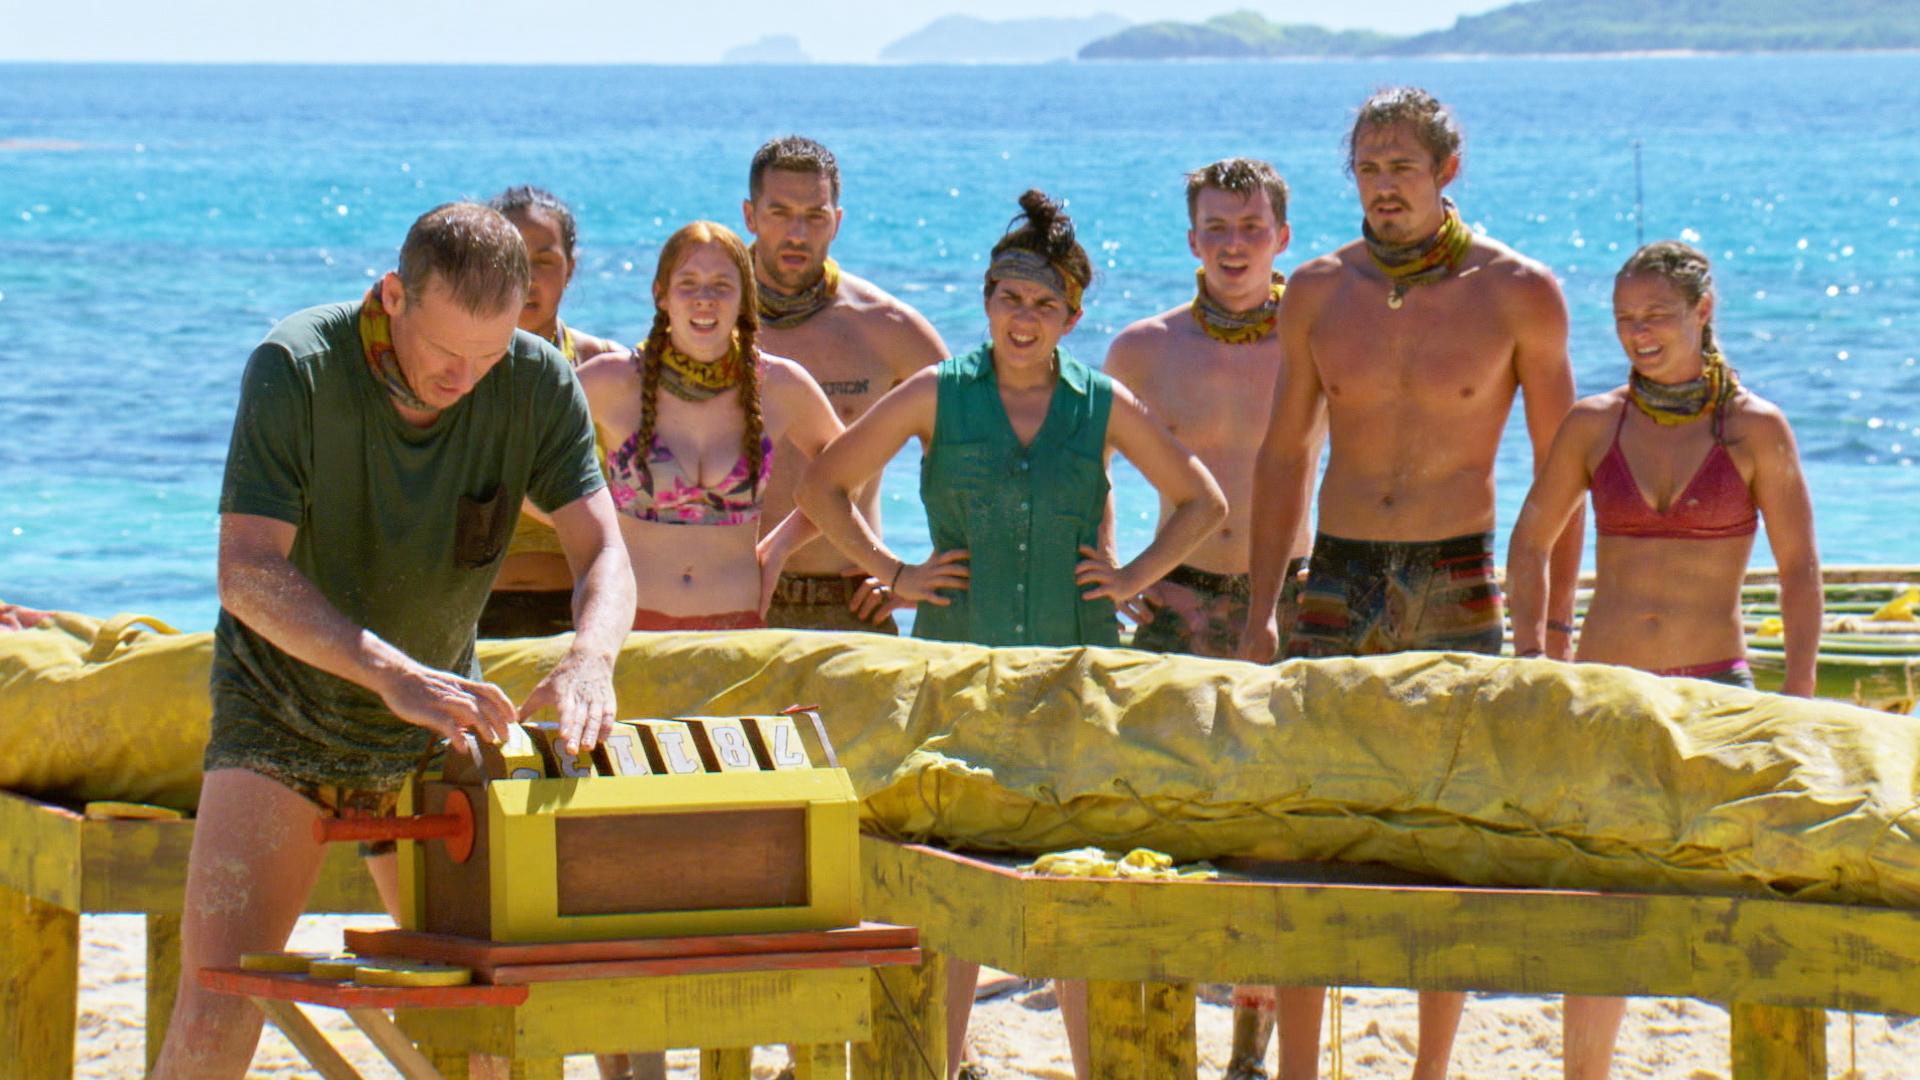 watch survivor season 31 episode 8